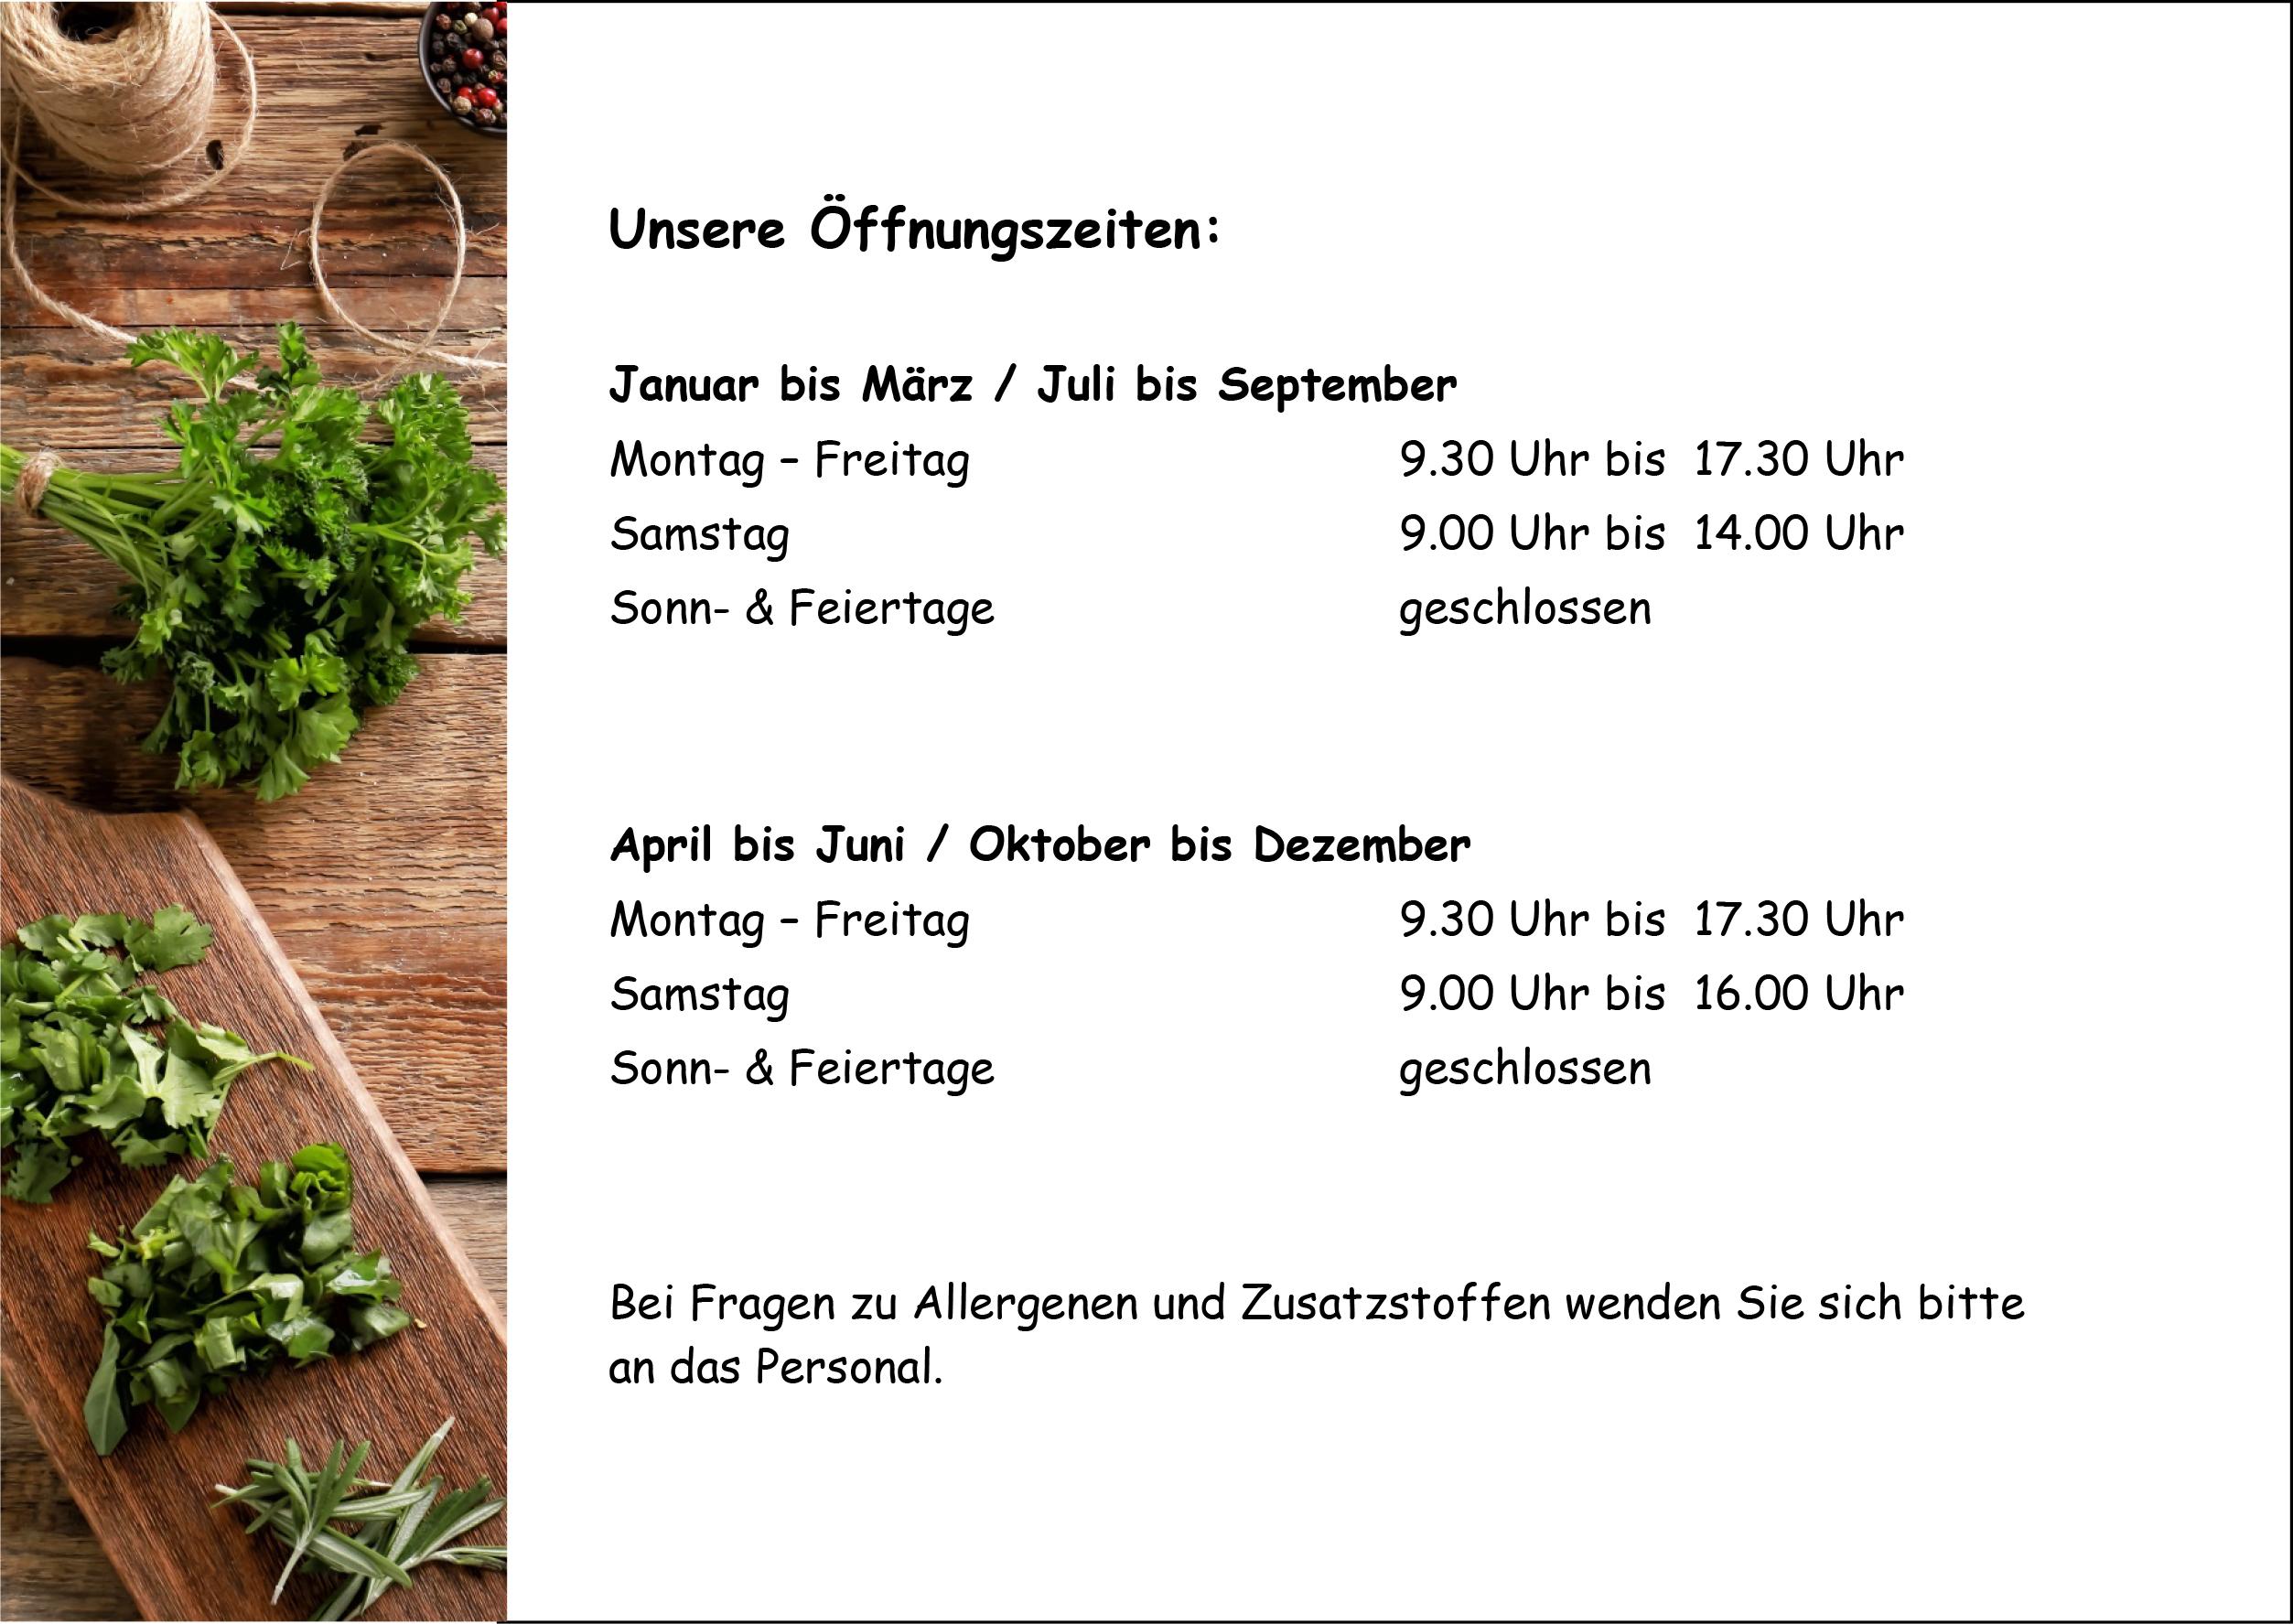 Öffnungszeiten Café Appenweier